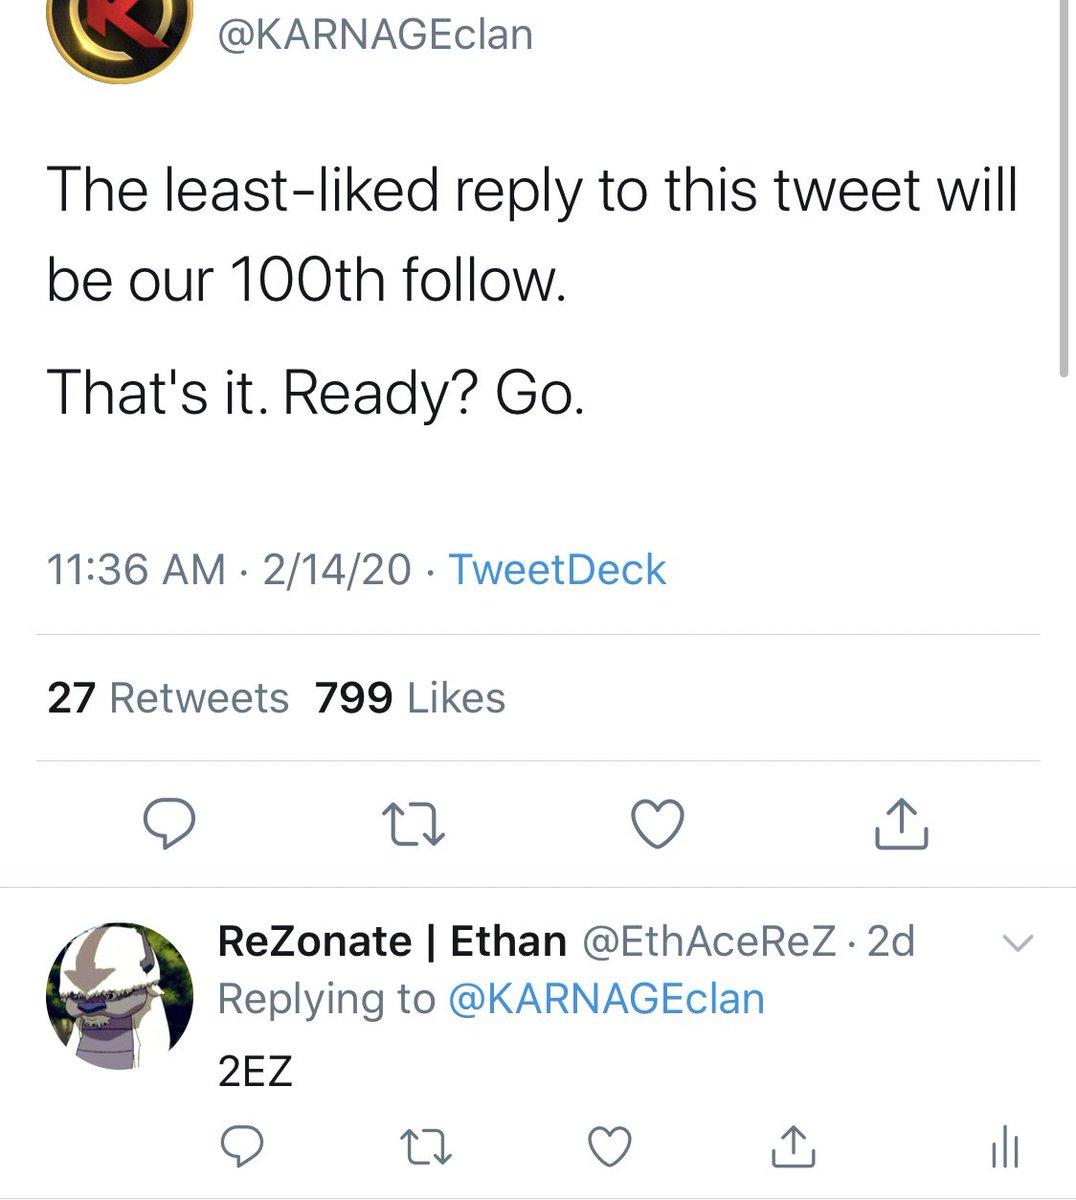 Plot twist I wasn't their 100th follow (even though I should be)pic.twitter.com/BKxA9foeJH